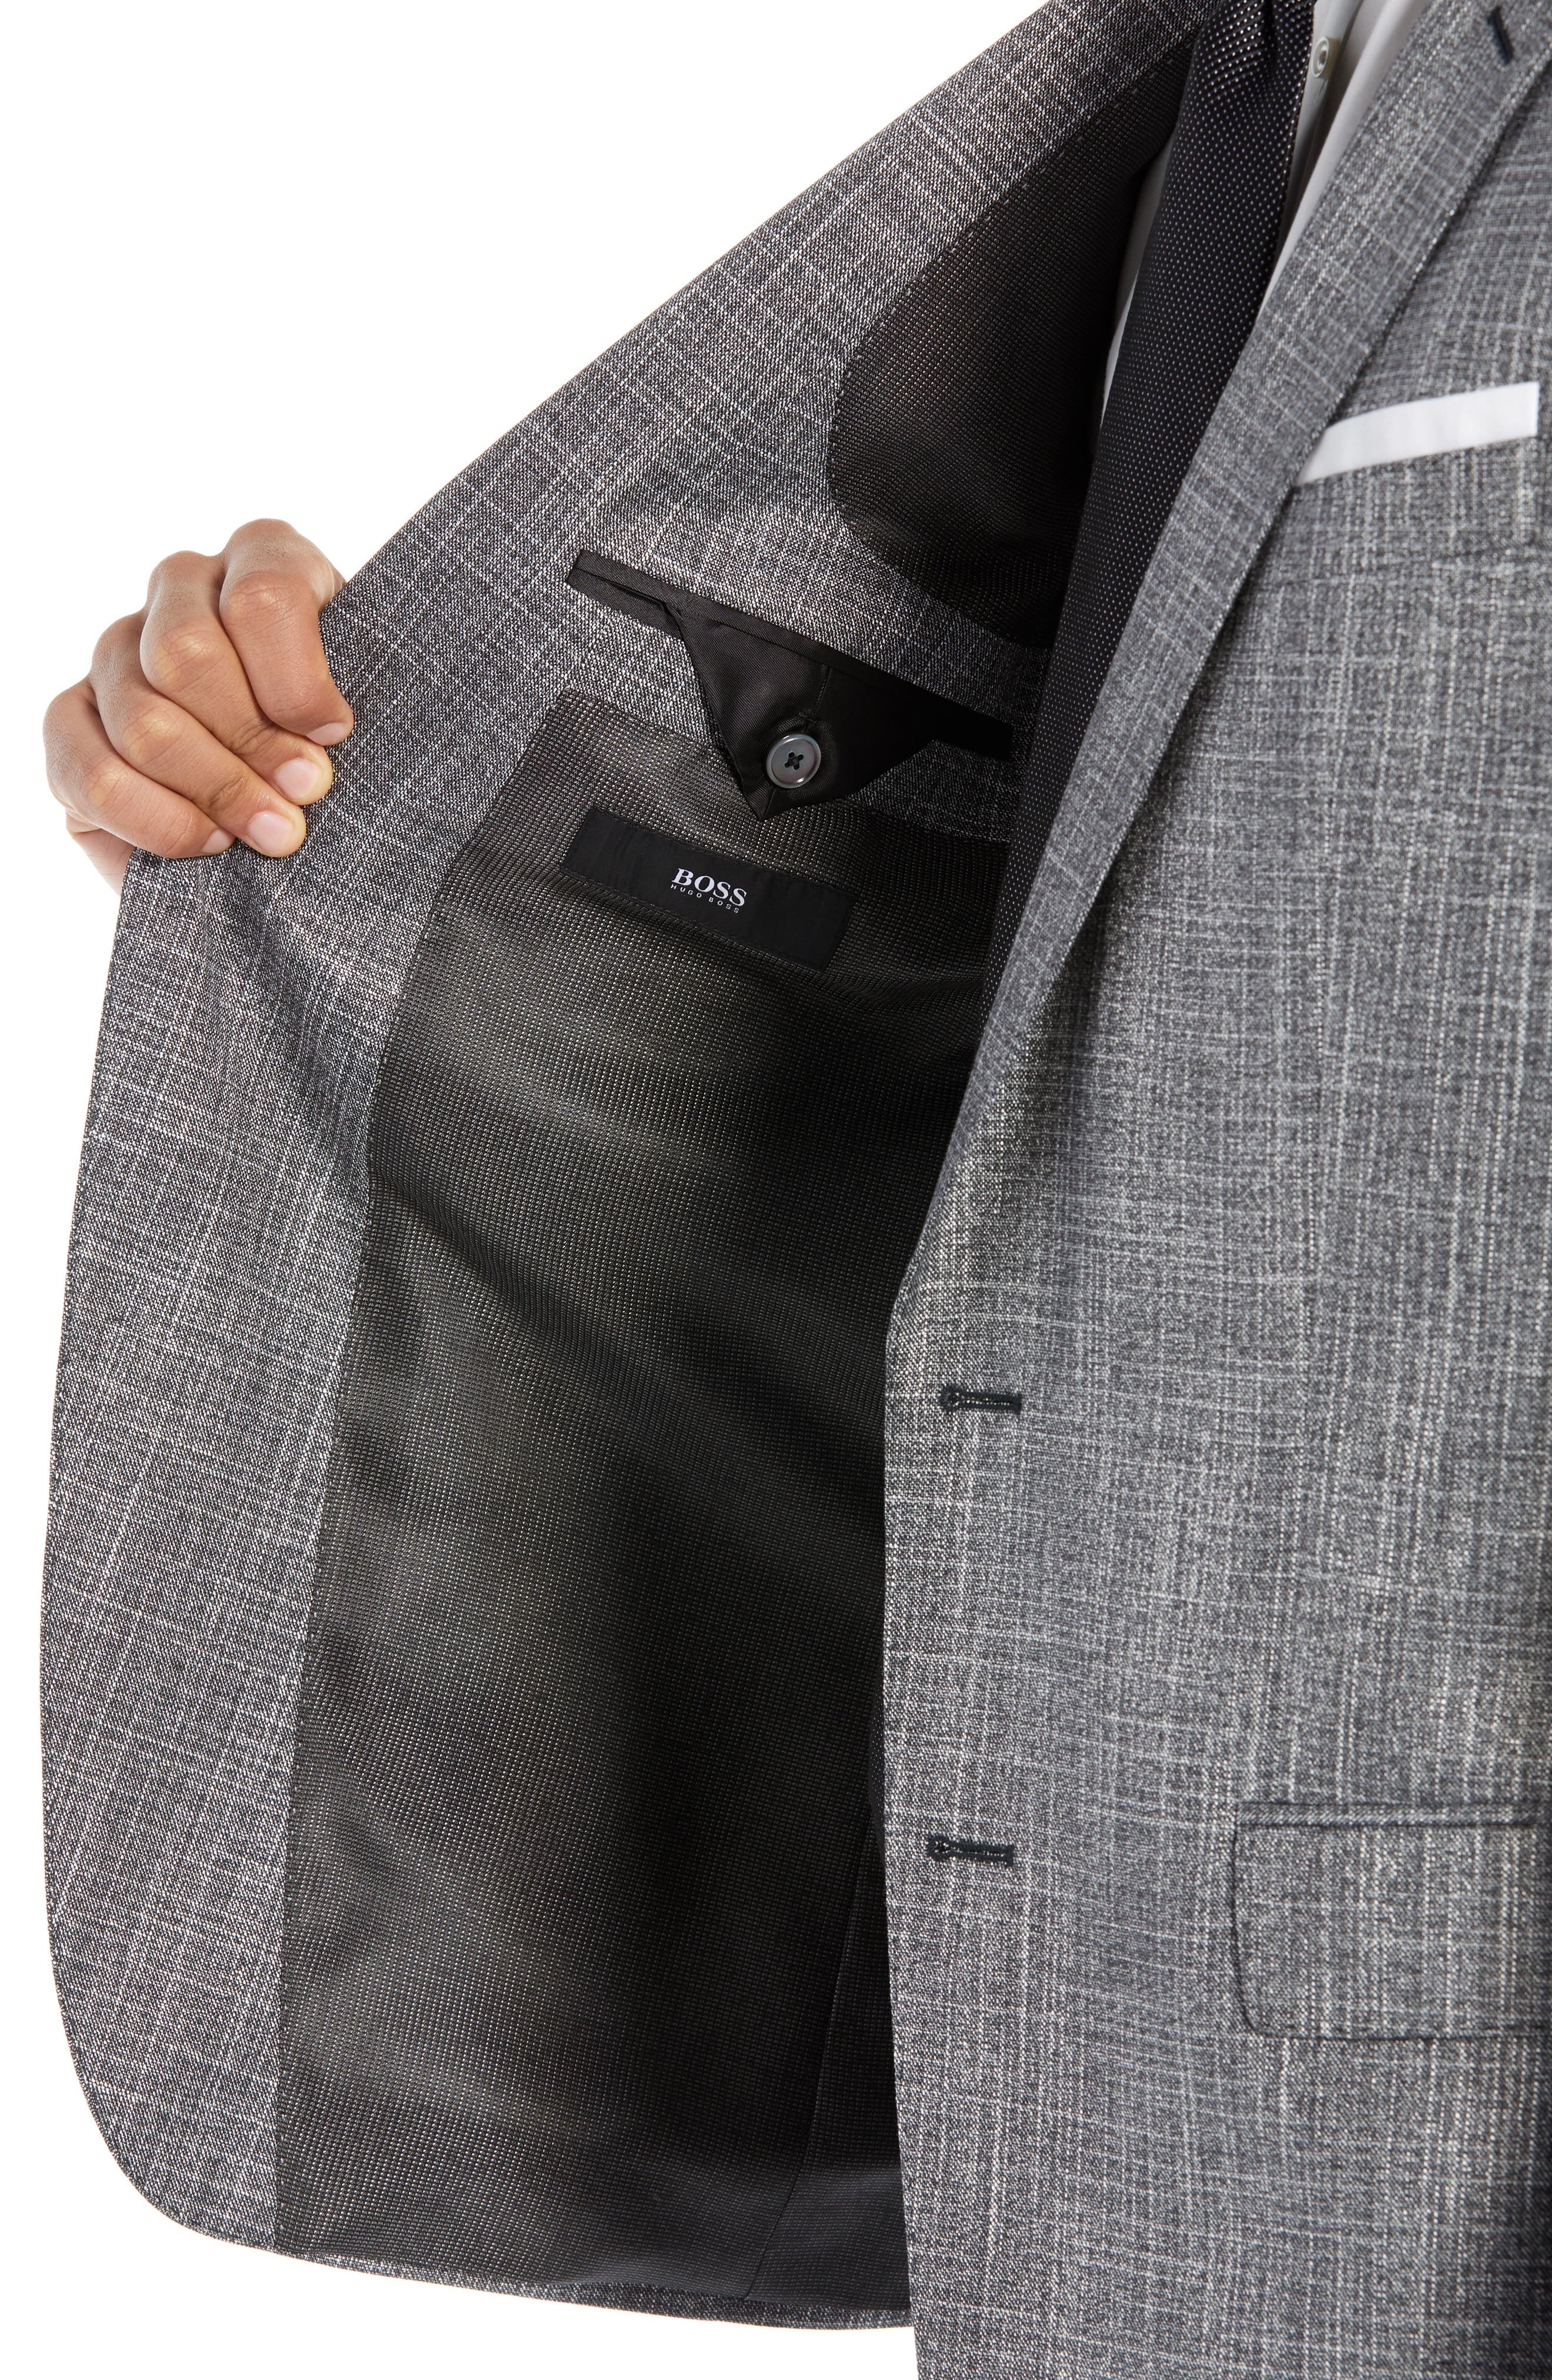 Hutson/Gander Trim Fit Solid Wool Blend Suit,                             Alternate thumbnail 4, color,                             MEDIUM GREY